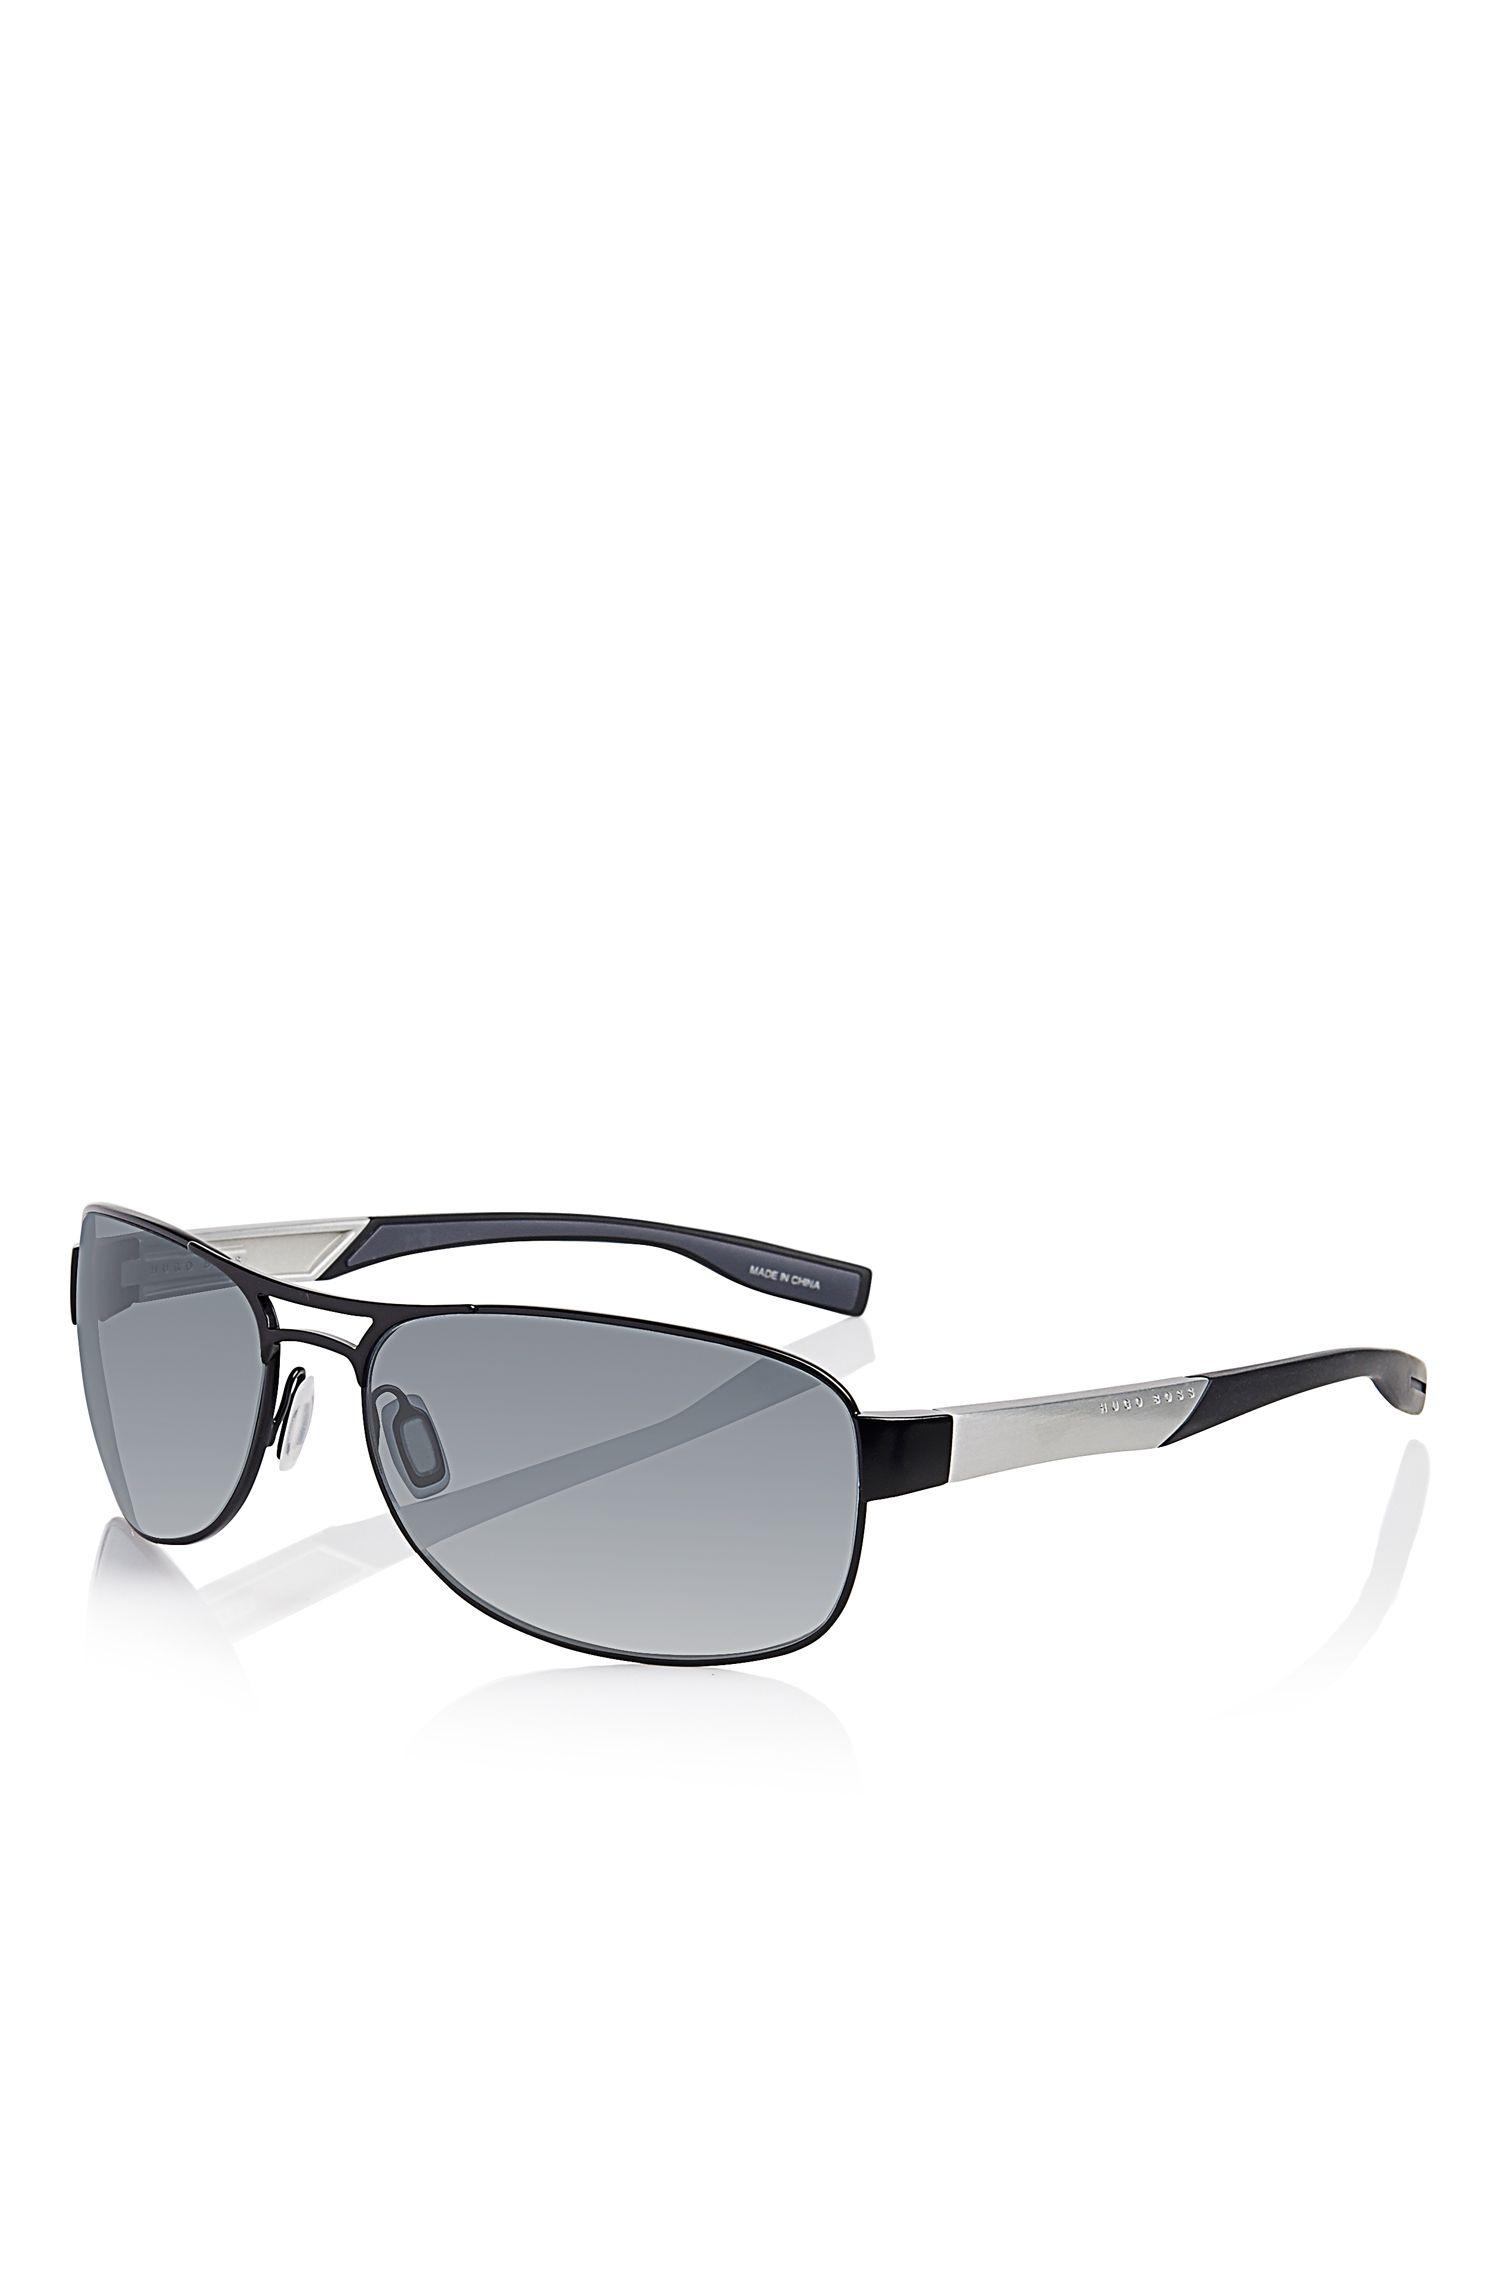 'Sunglasses' | Black Sporty Polarized Sunglasses